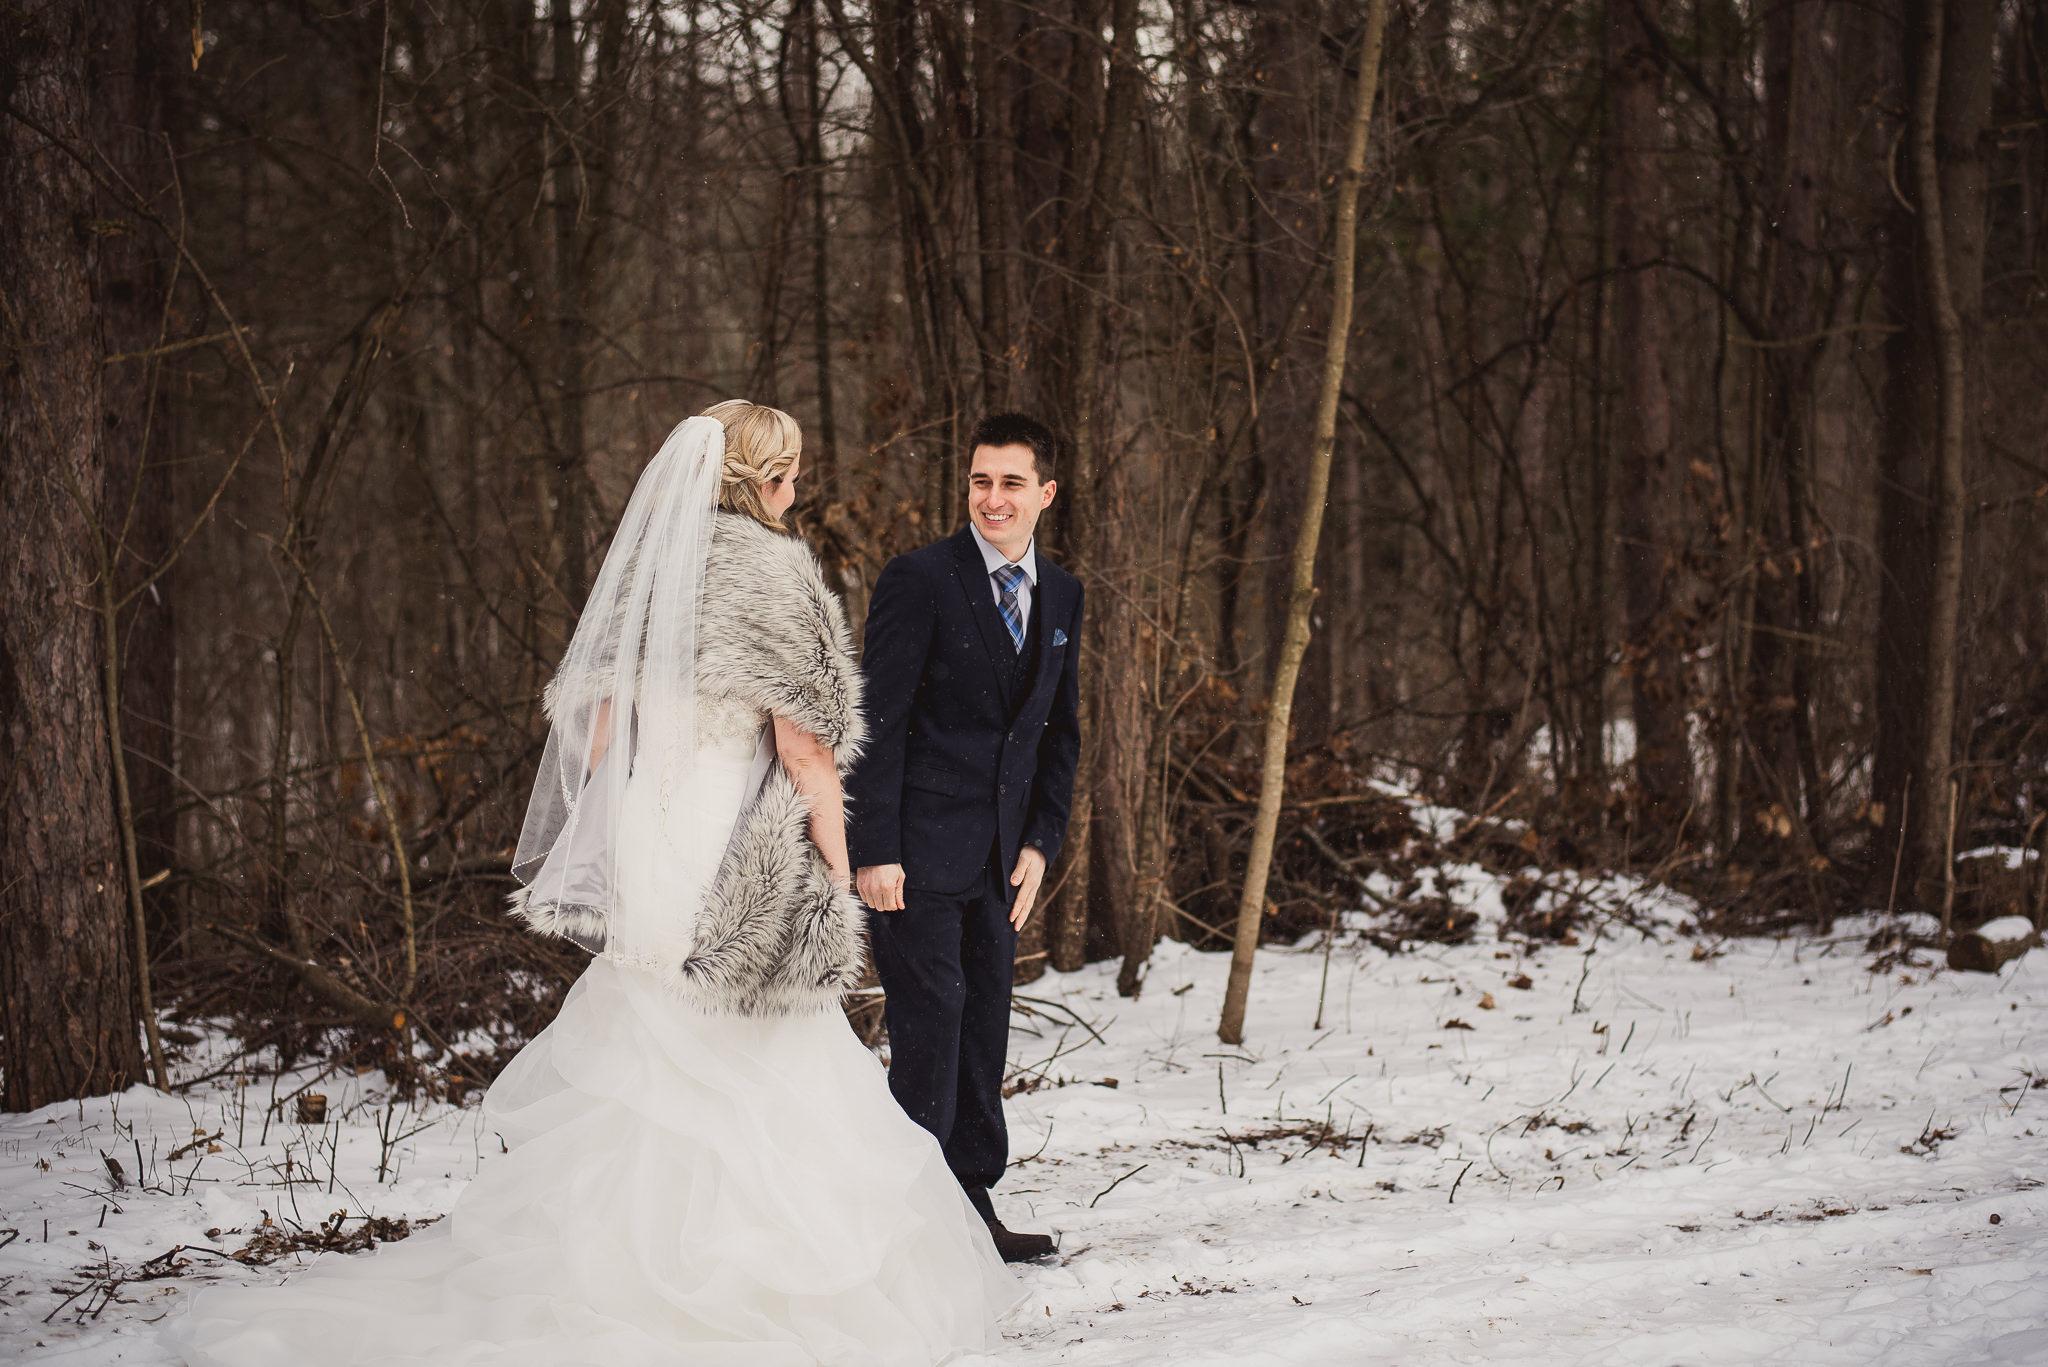 kortright center winter wedding photos 130 - Kortright Center Winter Wedding Photos